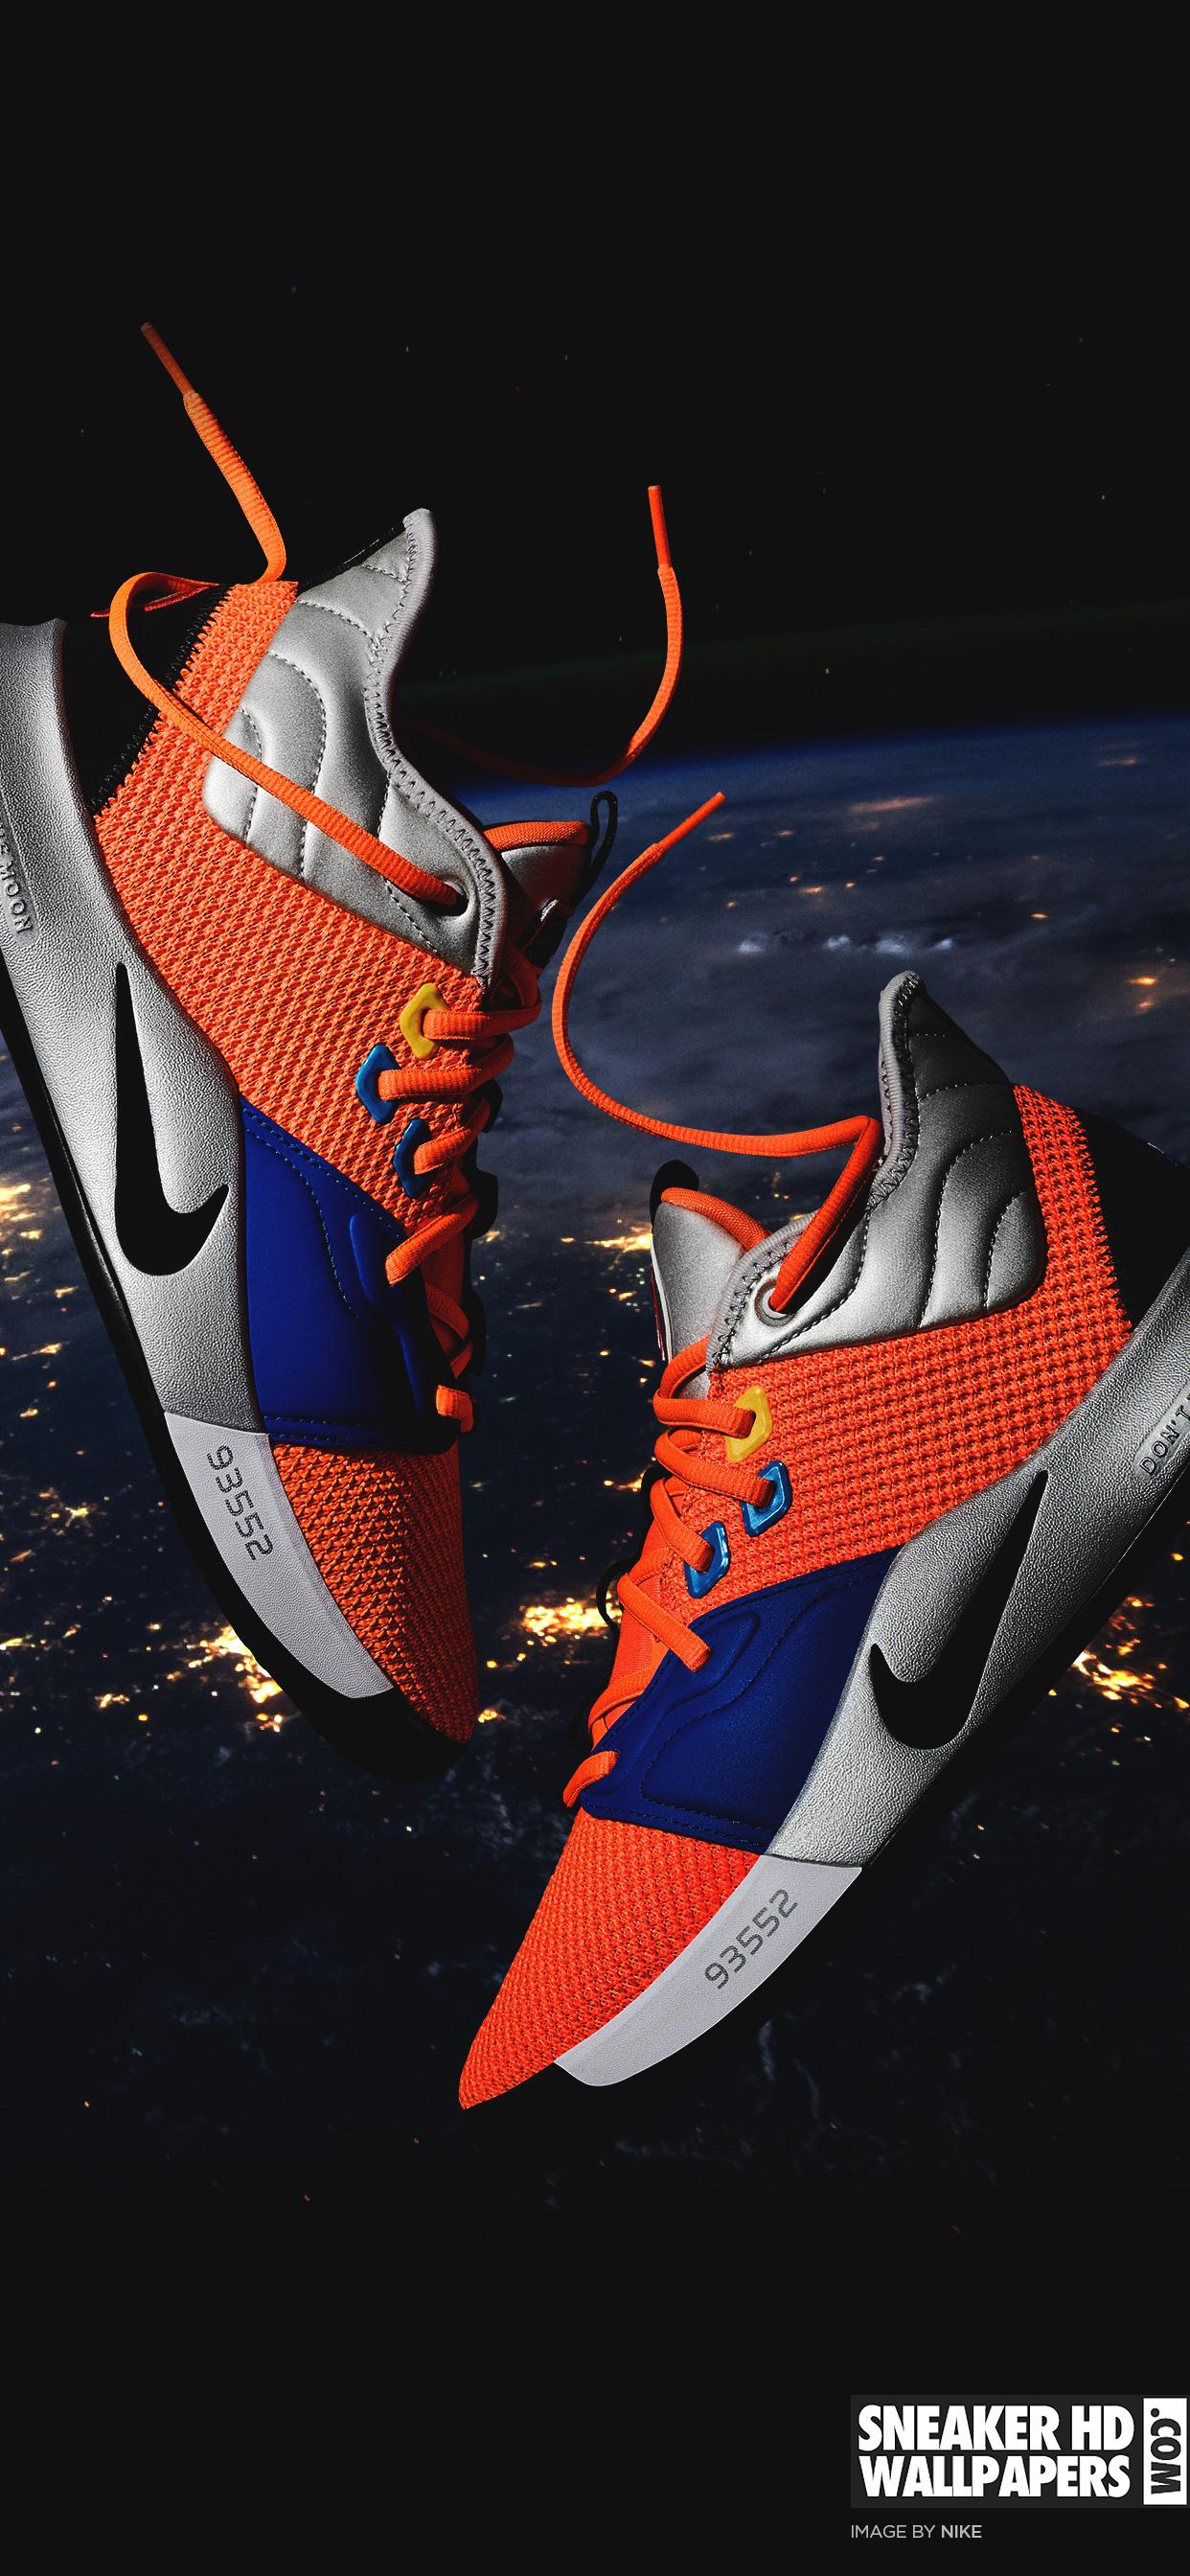 sneakerhdwallpapers com  u2013 your favorite sneakers in hd and